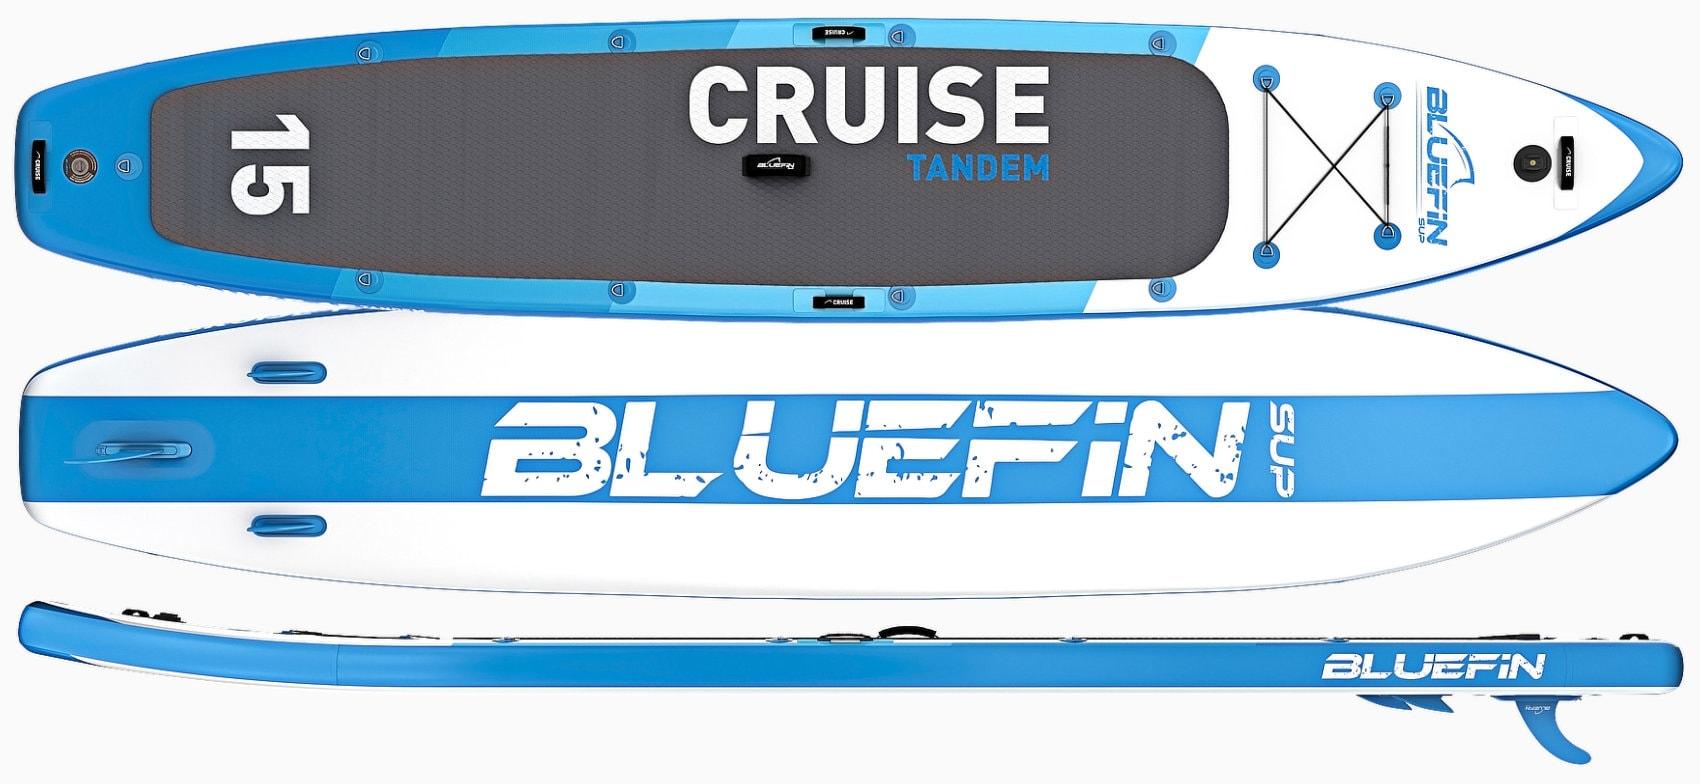 Bluefin SUP Cruise 15' Tandem Paddle Board